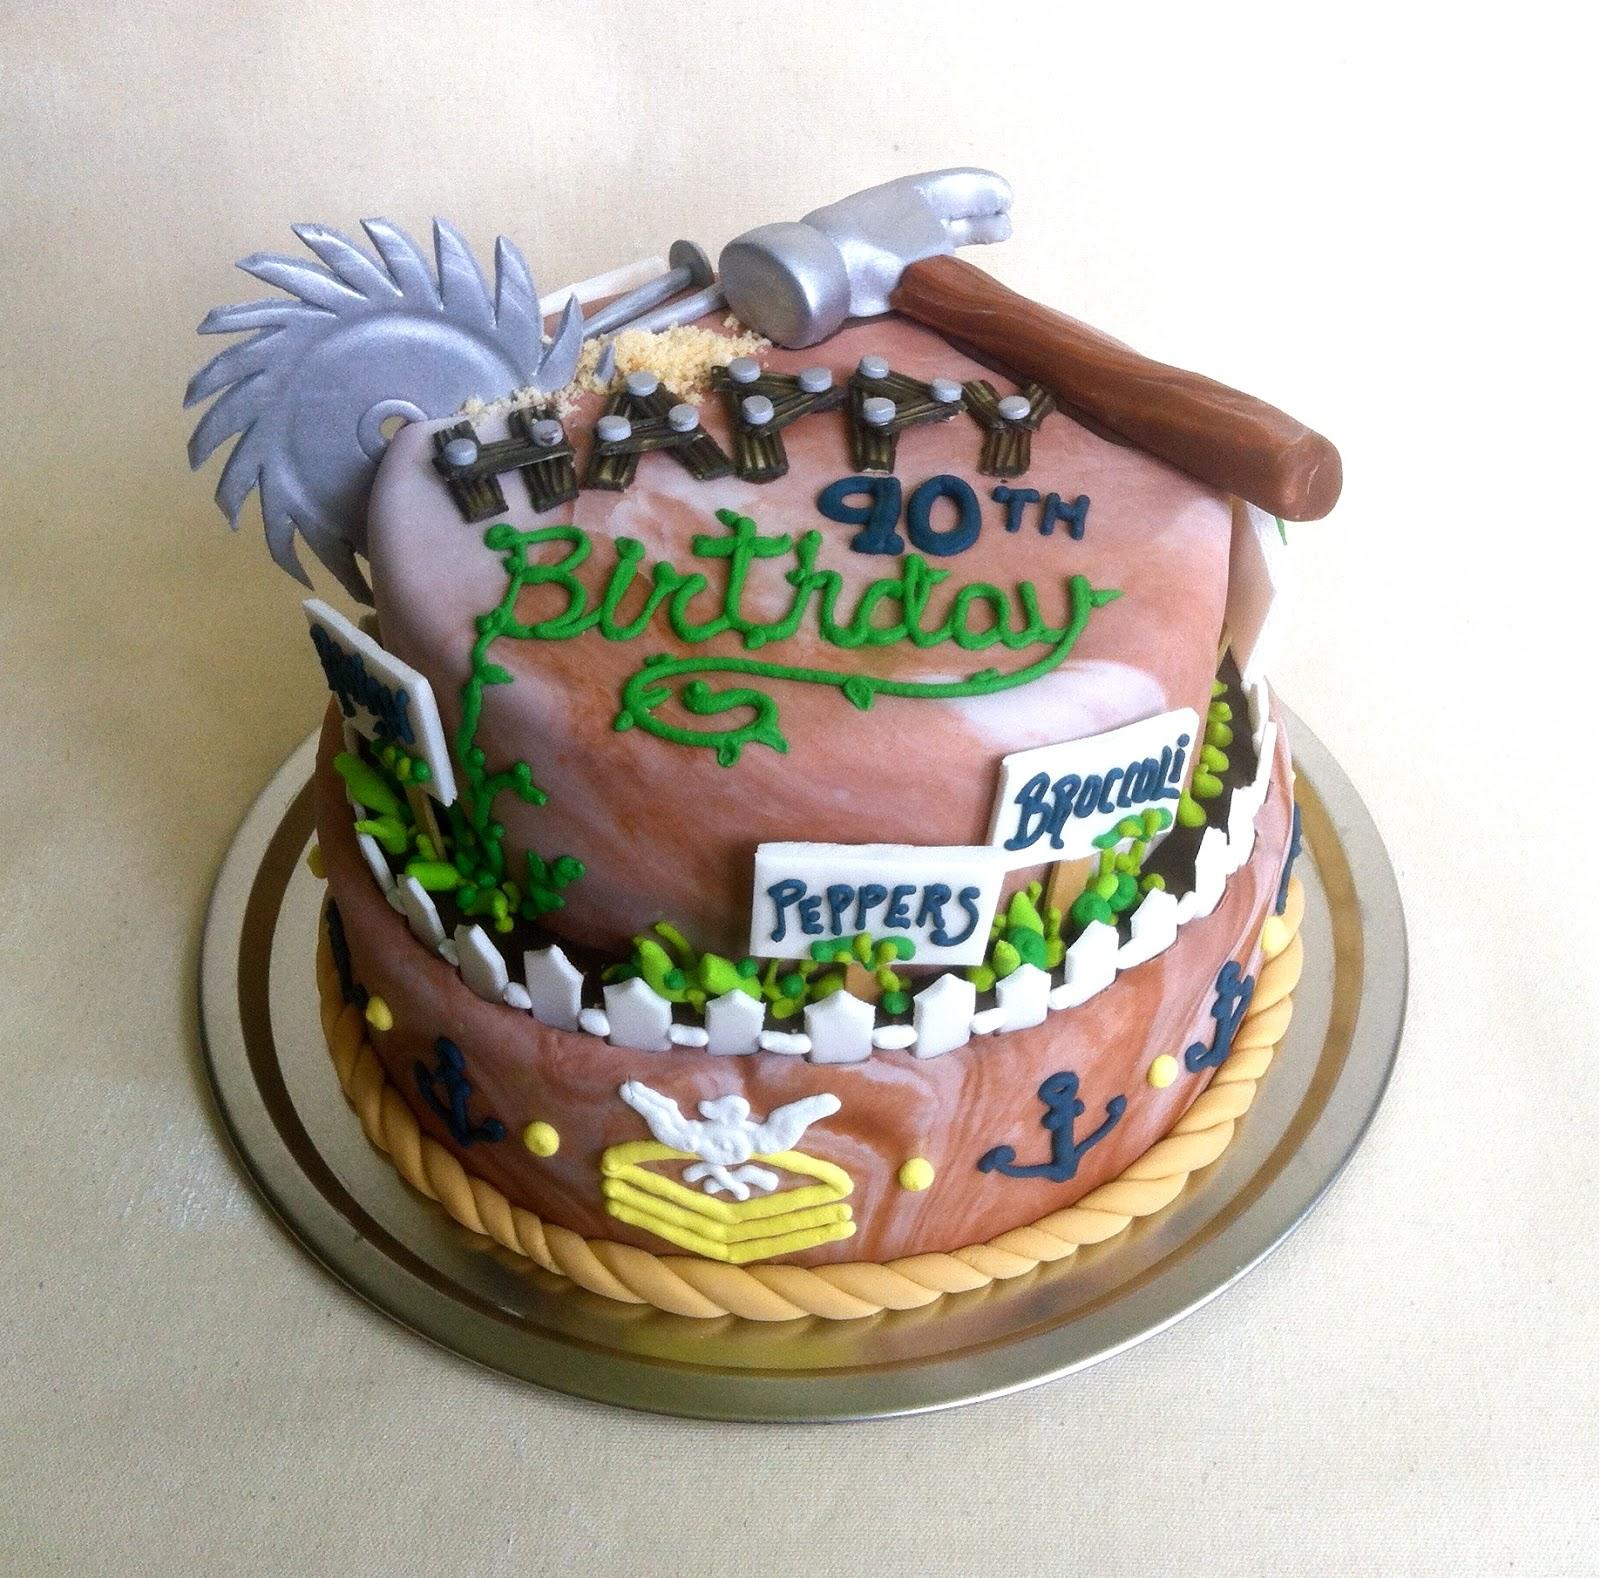 Ry Pfaff Cakes